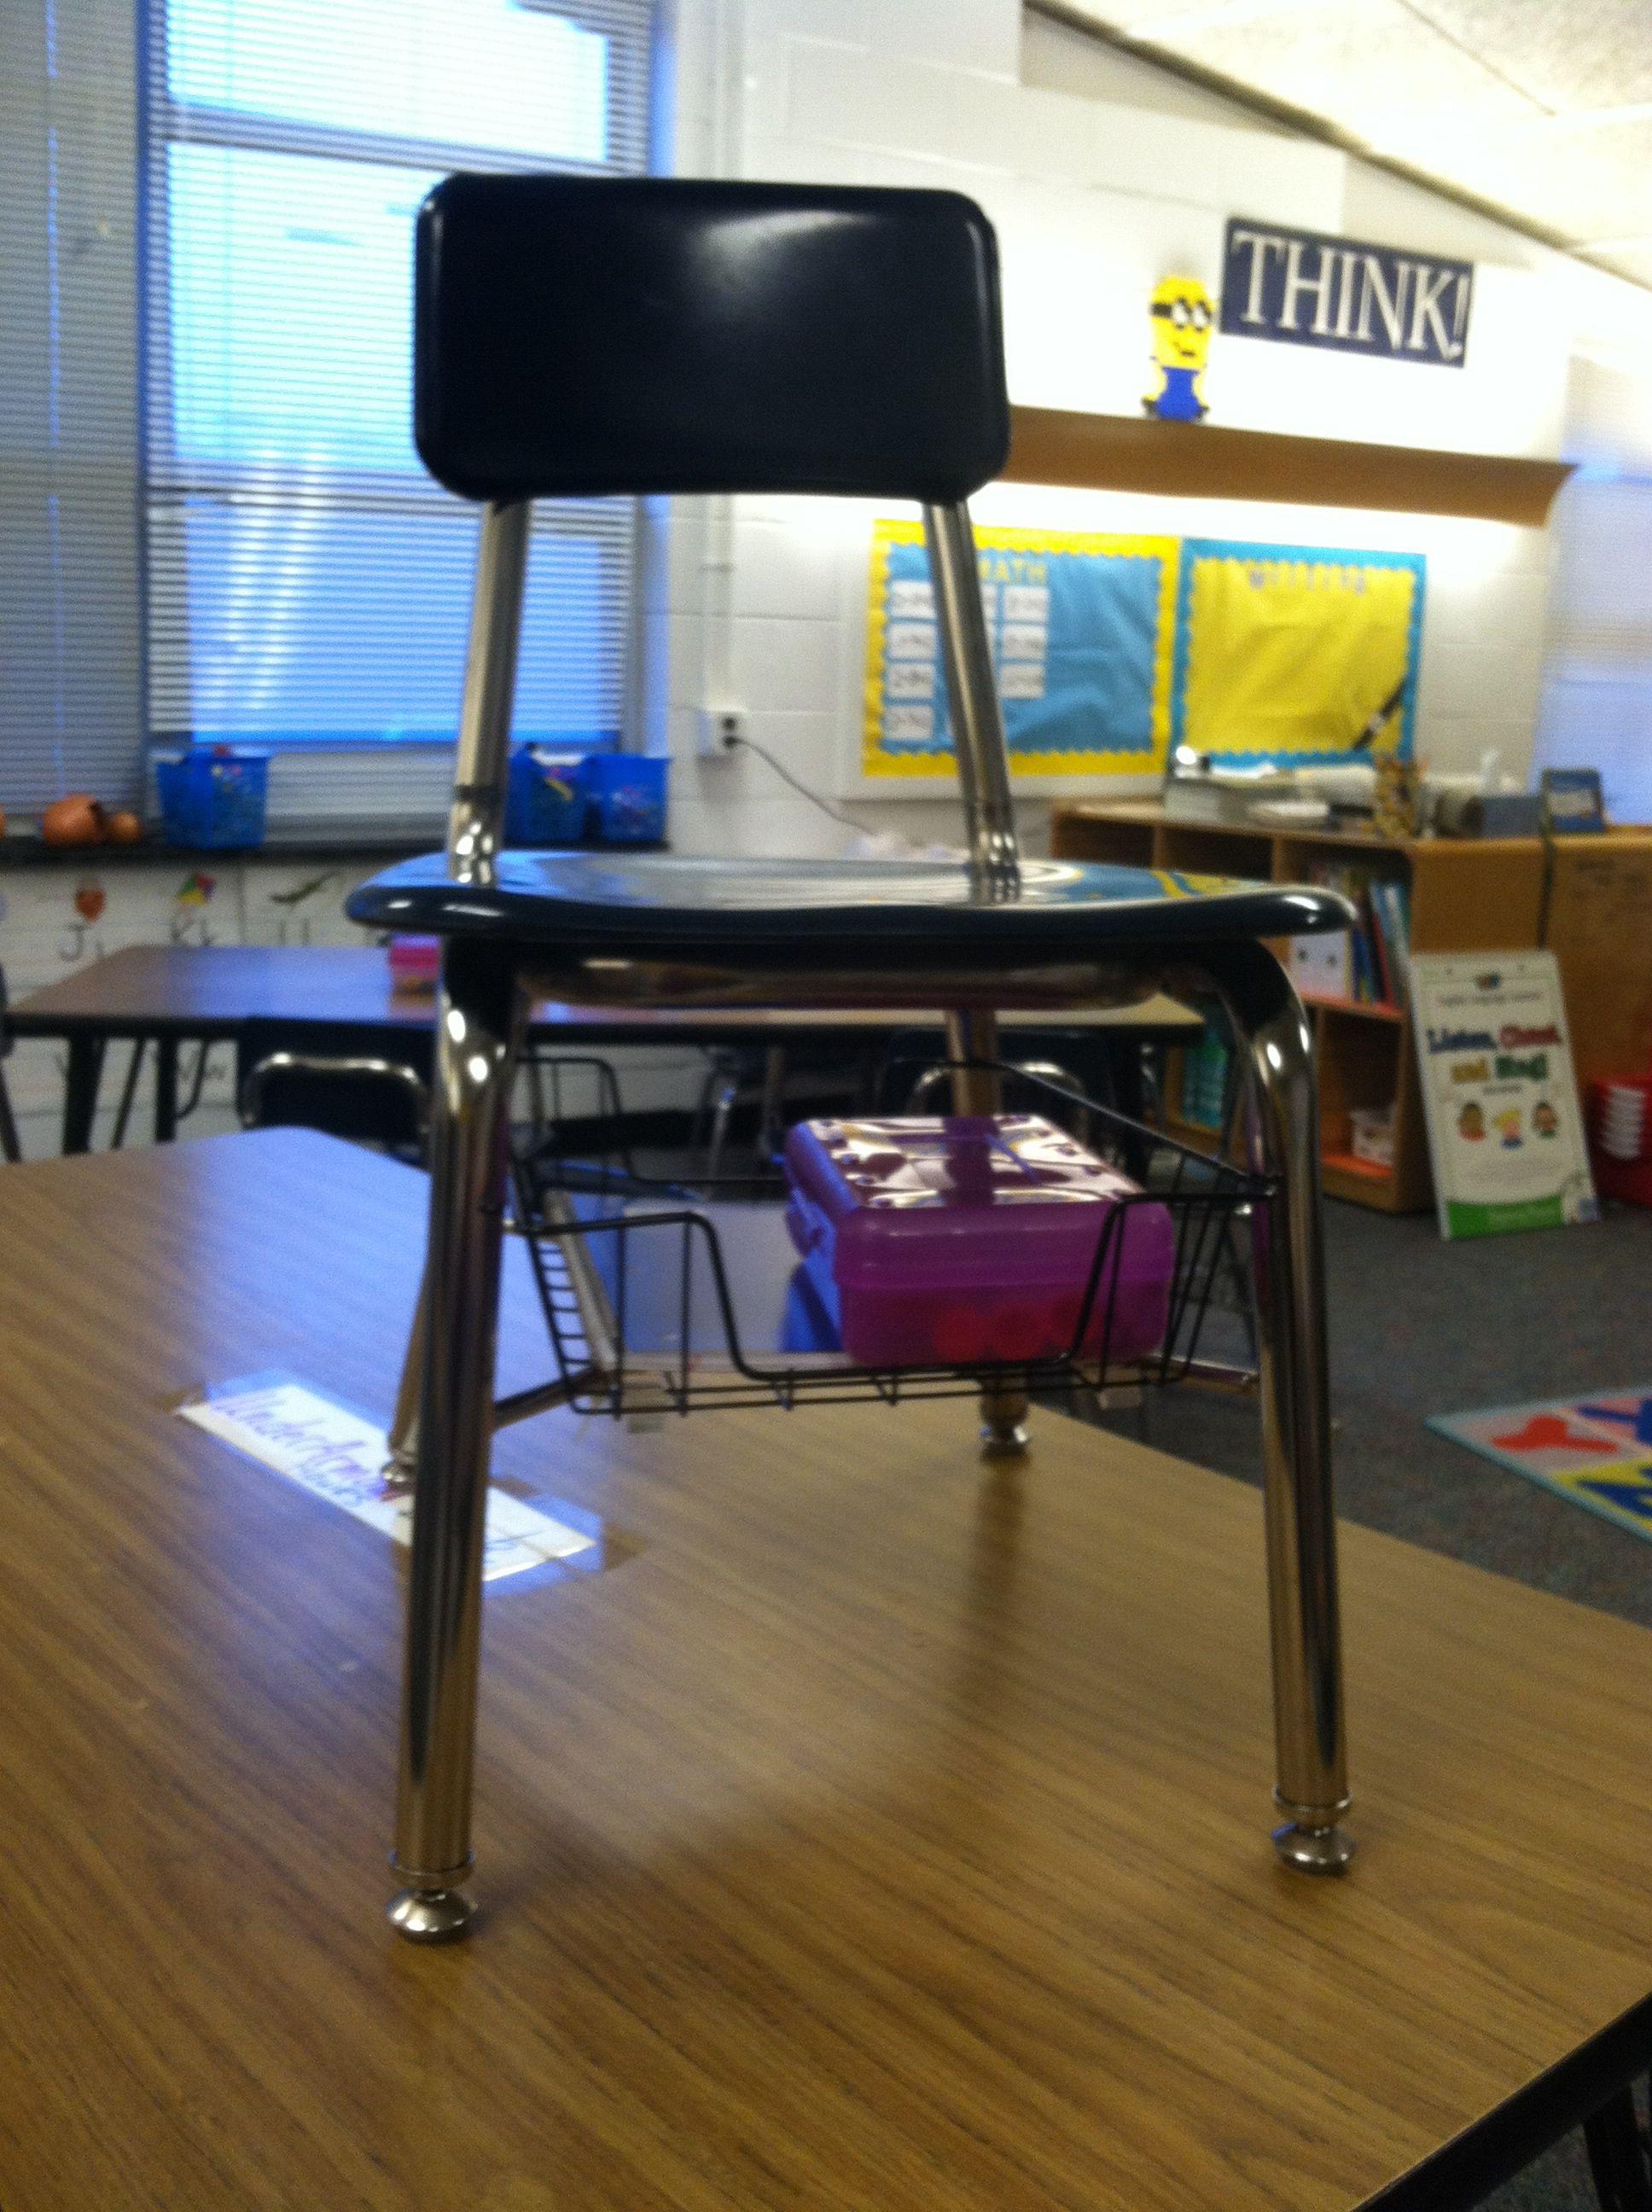 Clroom Under Chair Storage Standard Wire Paper Basket Zip Tied To The